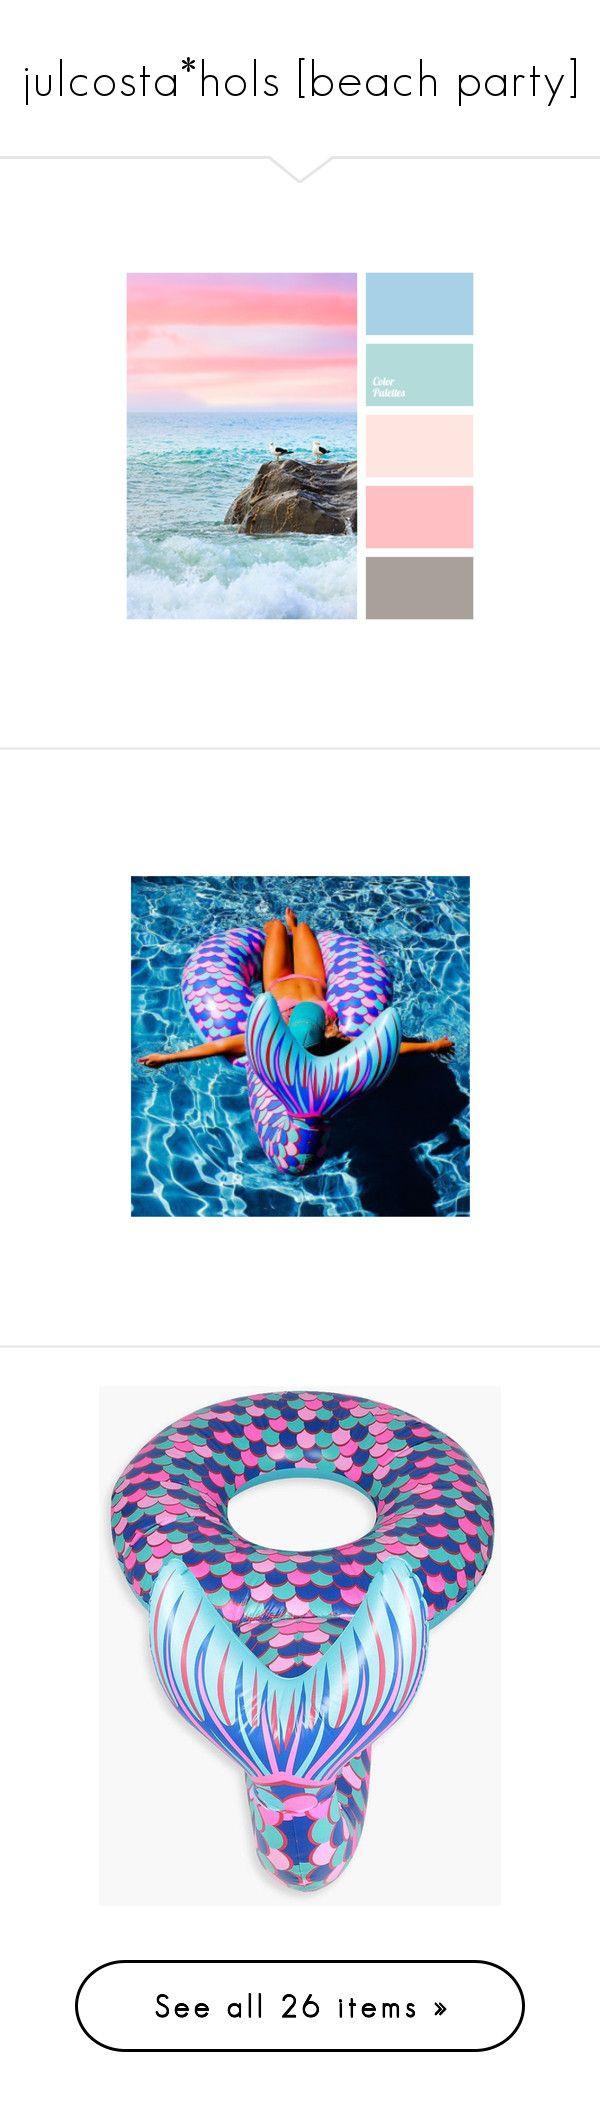 """julcosta*hols [beach party]"" by zaiee on Polyvore featuring people, hair, pictures, swimwear, bikinis, bikini tops, halter neck bikini top, swimsuit tops, halter bikini and tankini tops"